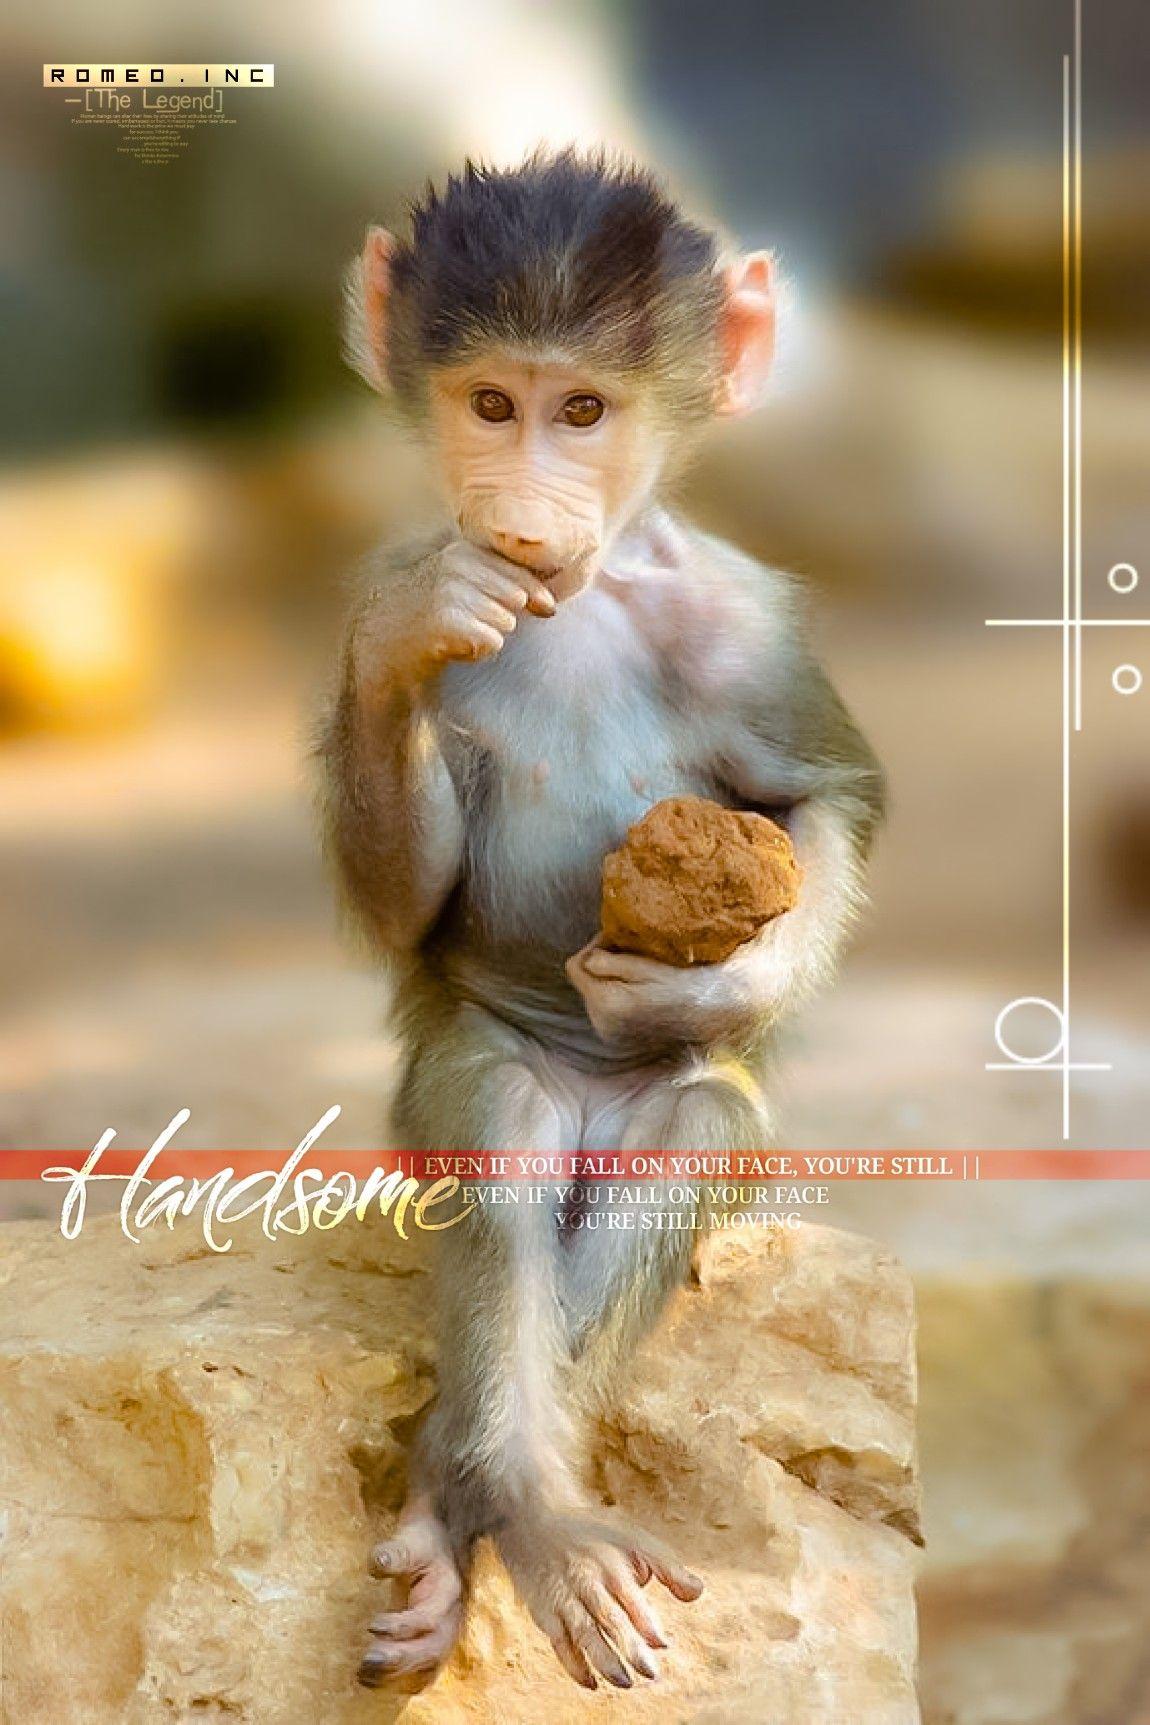 Pin by romeoabhishekyt on Edited hd dps Cute baby